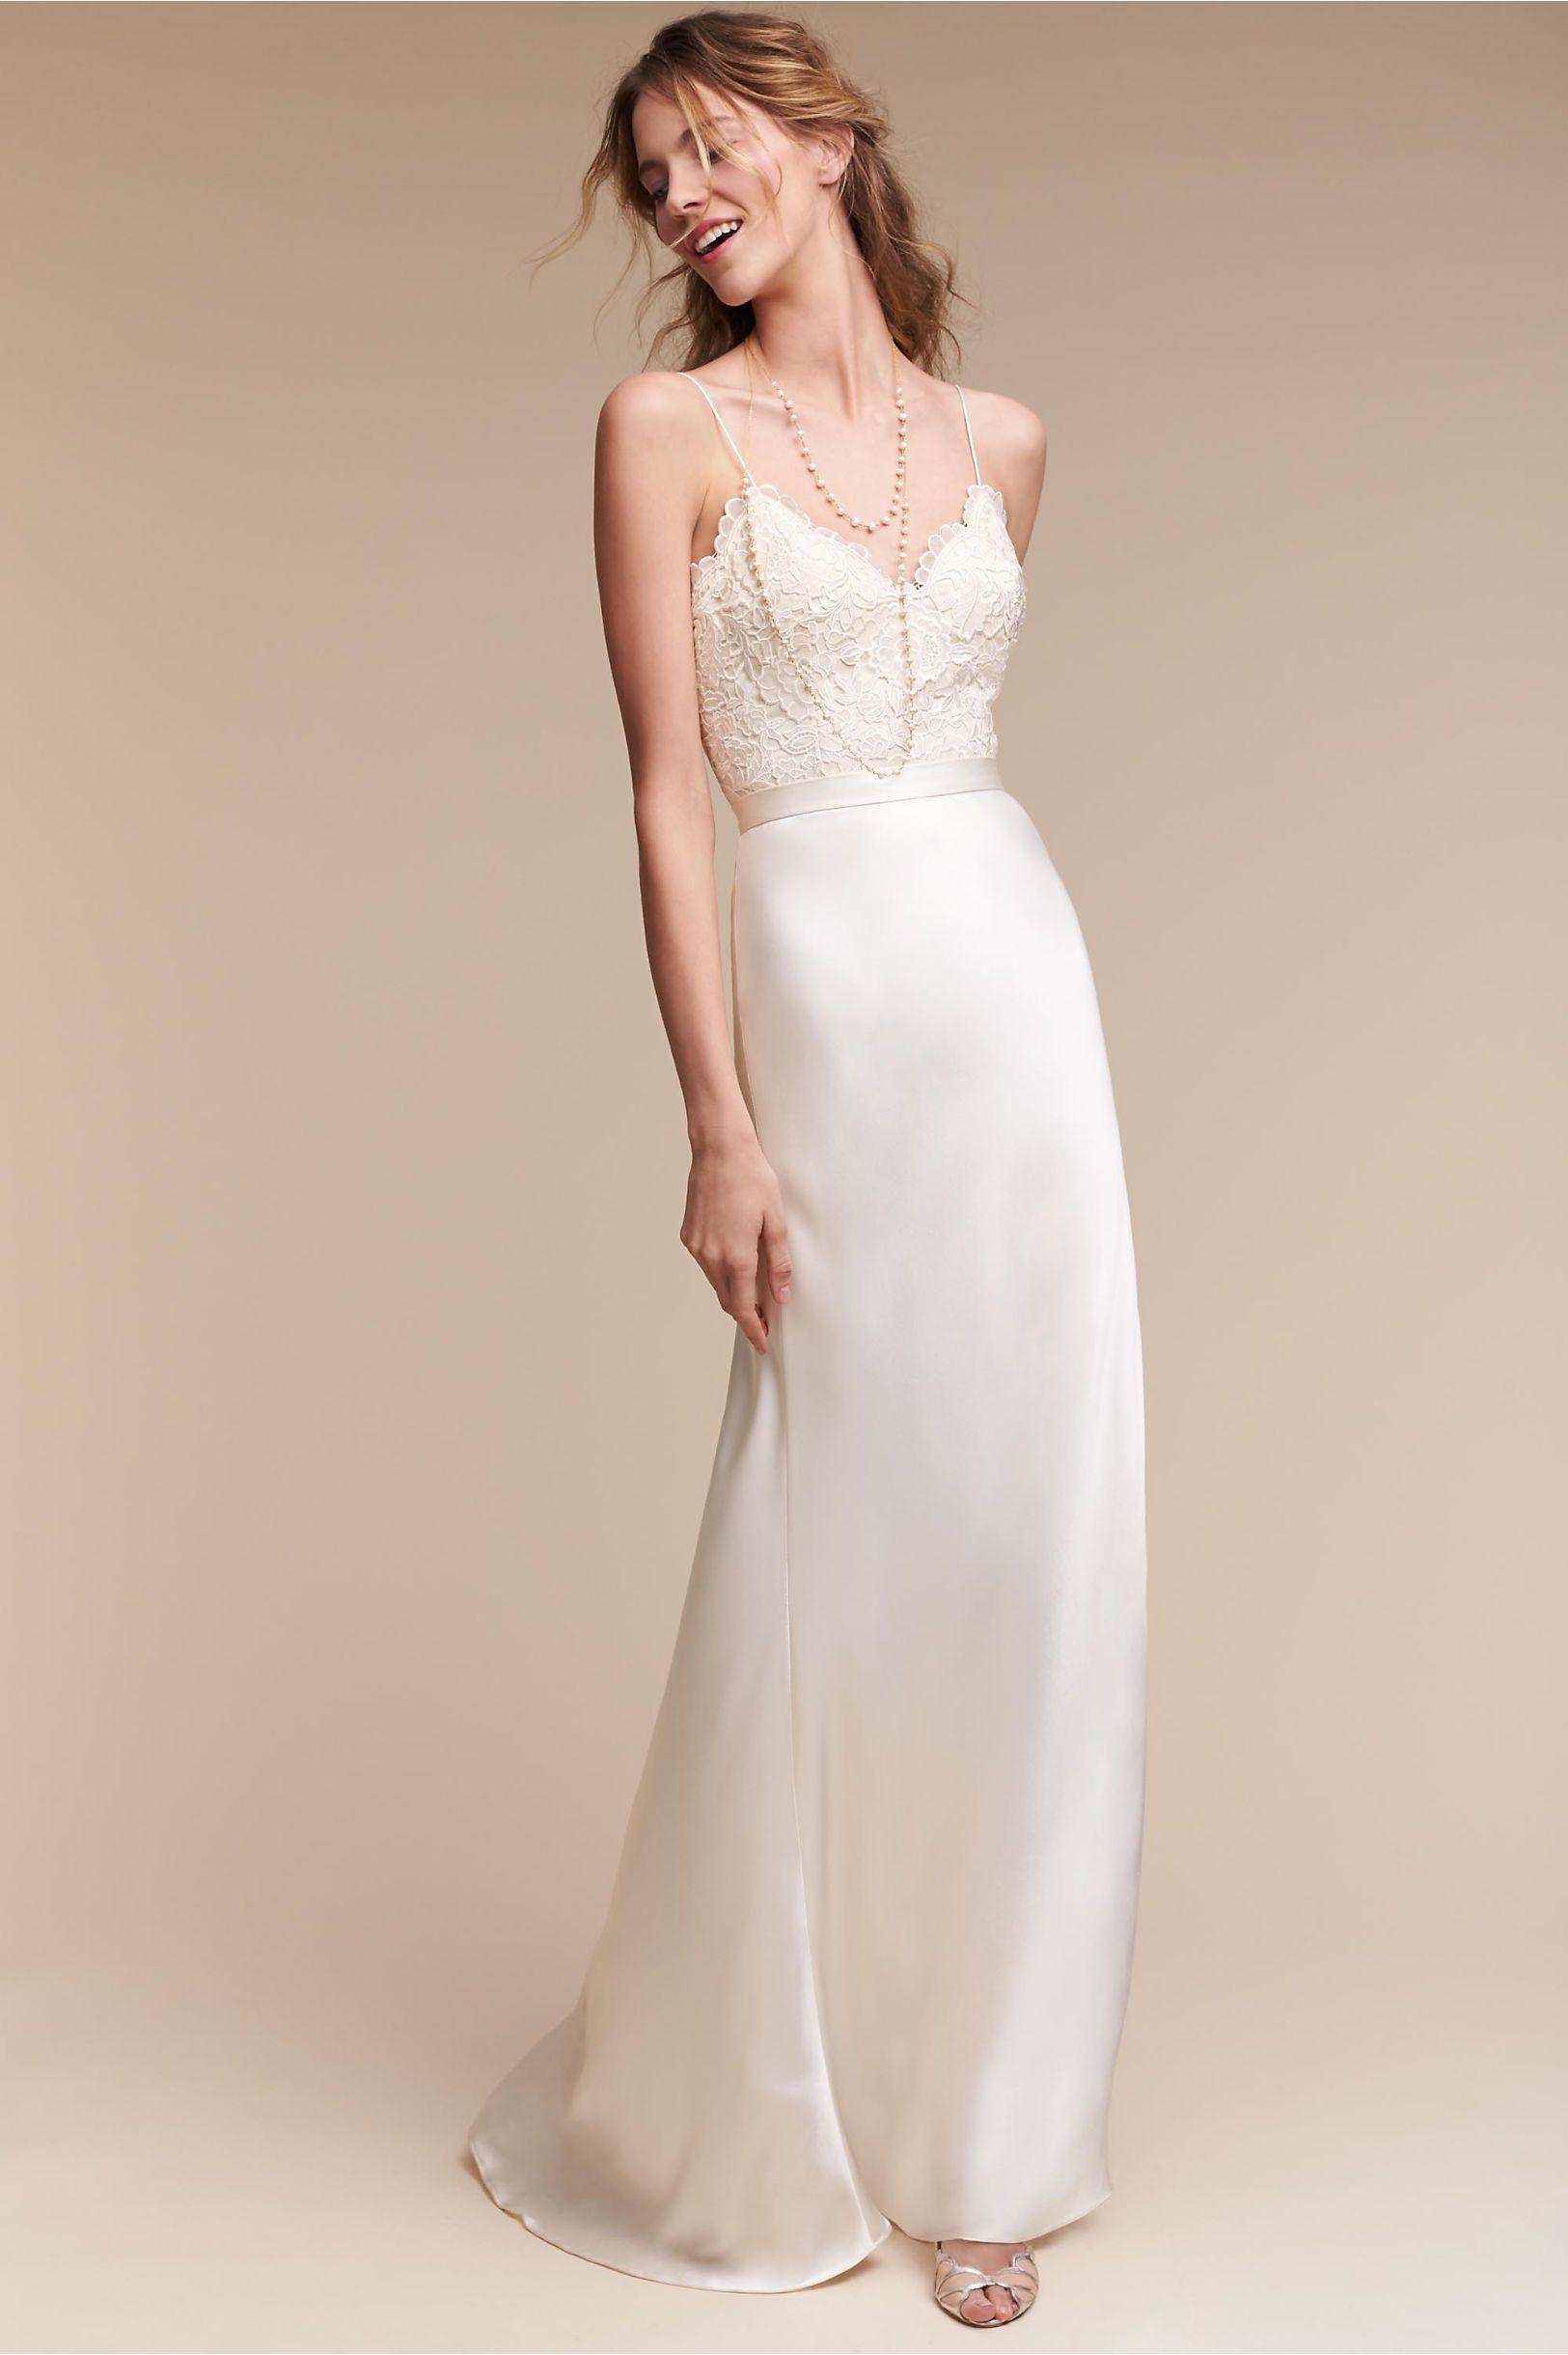 Catherine Deane Havana Corset Top Bhldn Wedding Dress Wedding